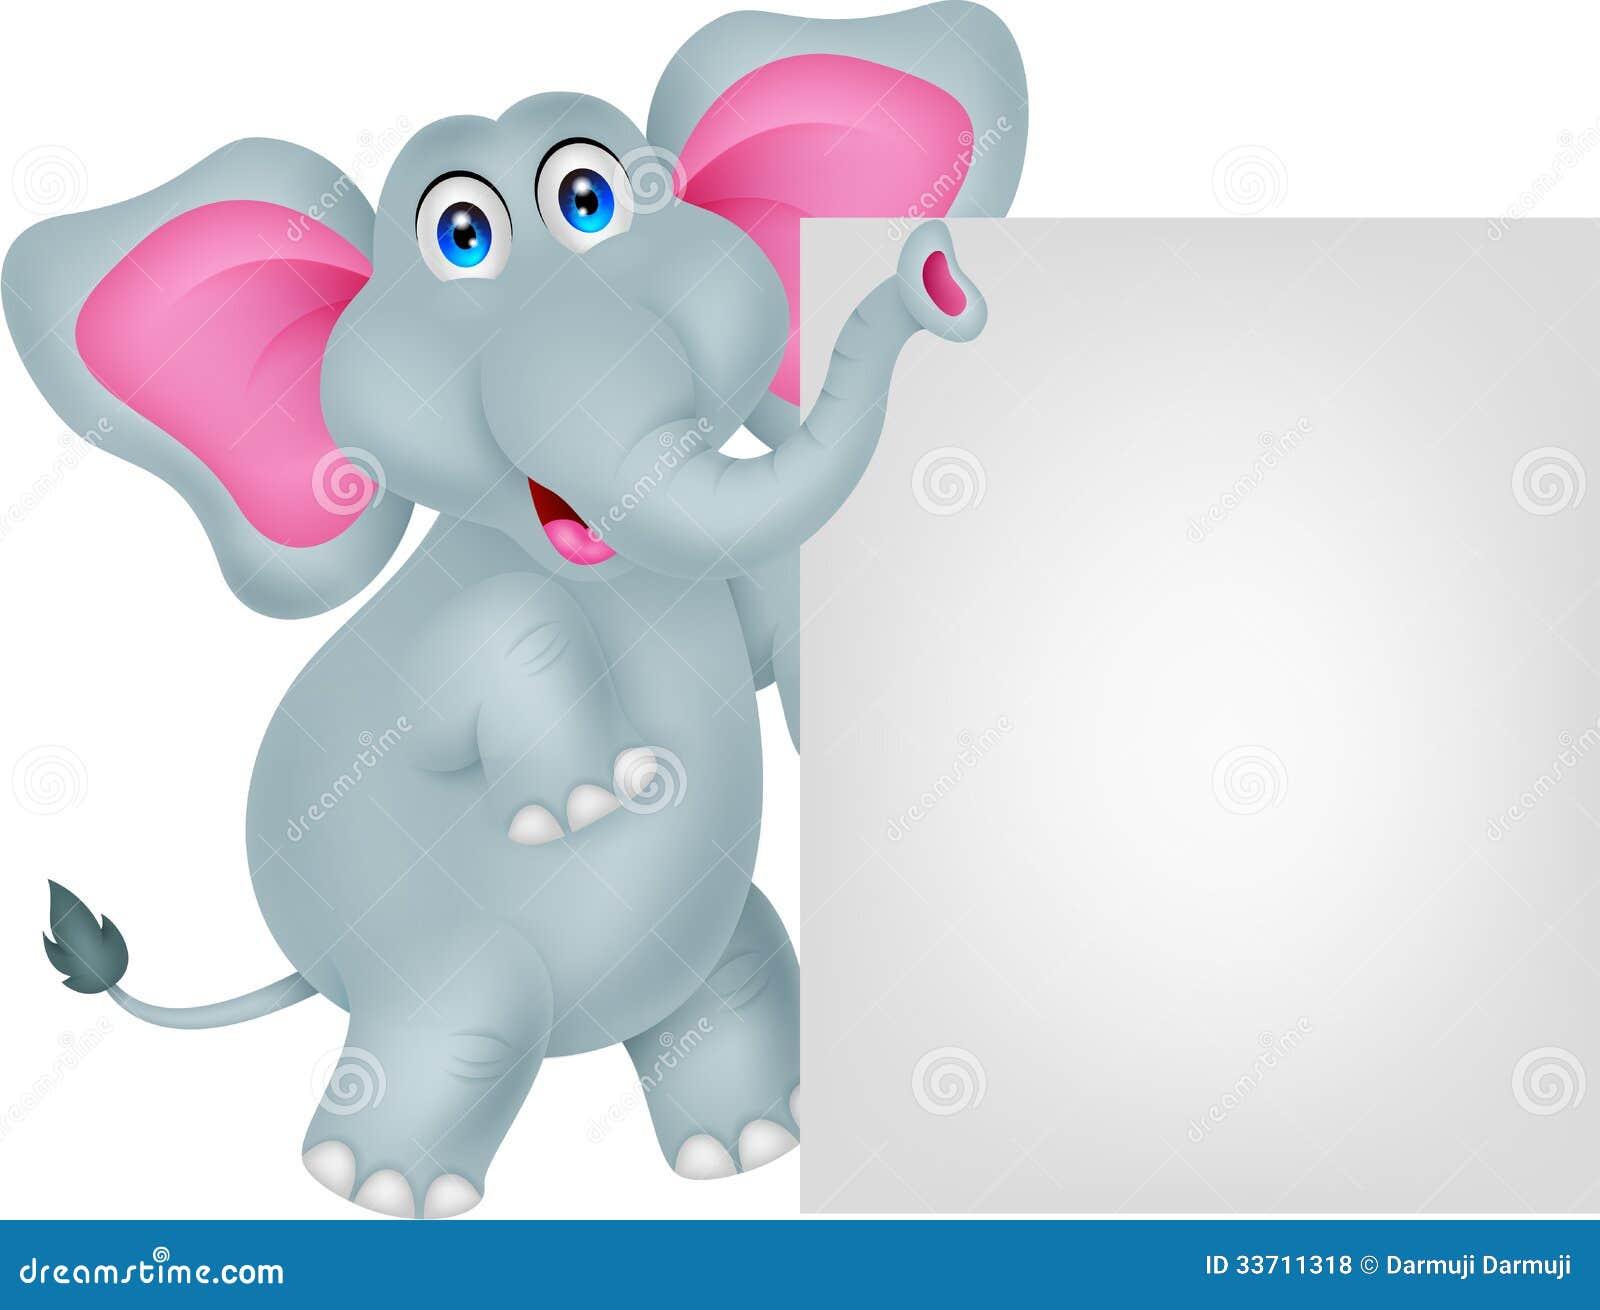 Funny Elephant Cartoon With Blank Sign Royalty Free Stock ...